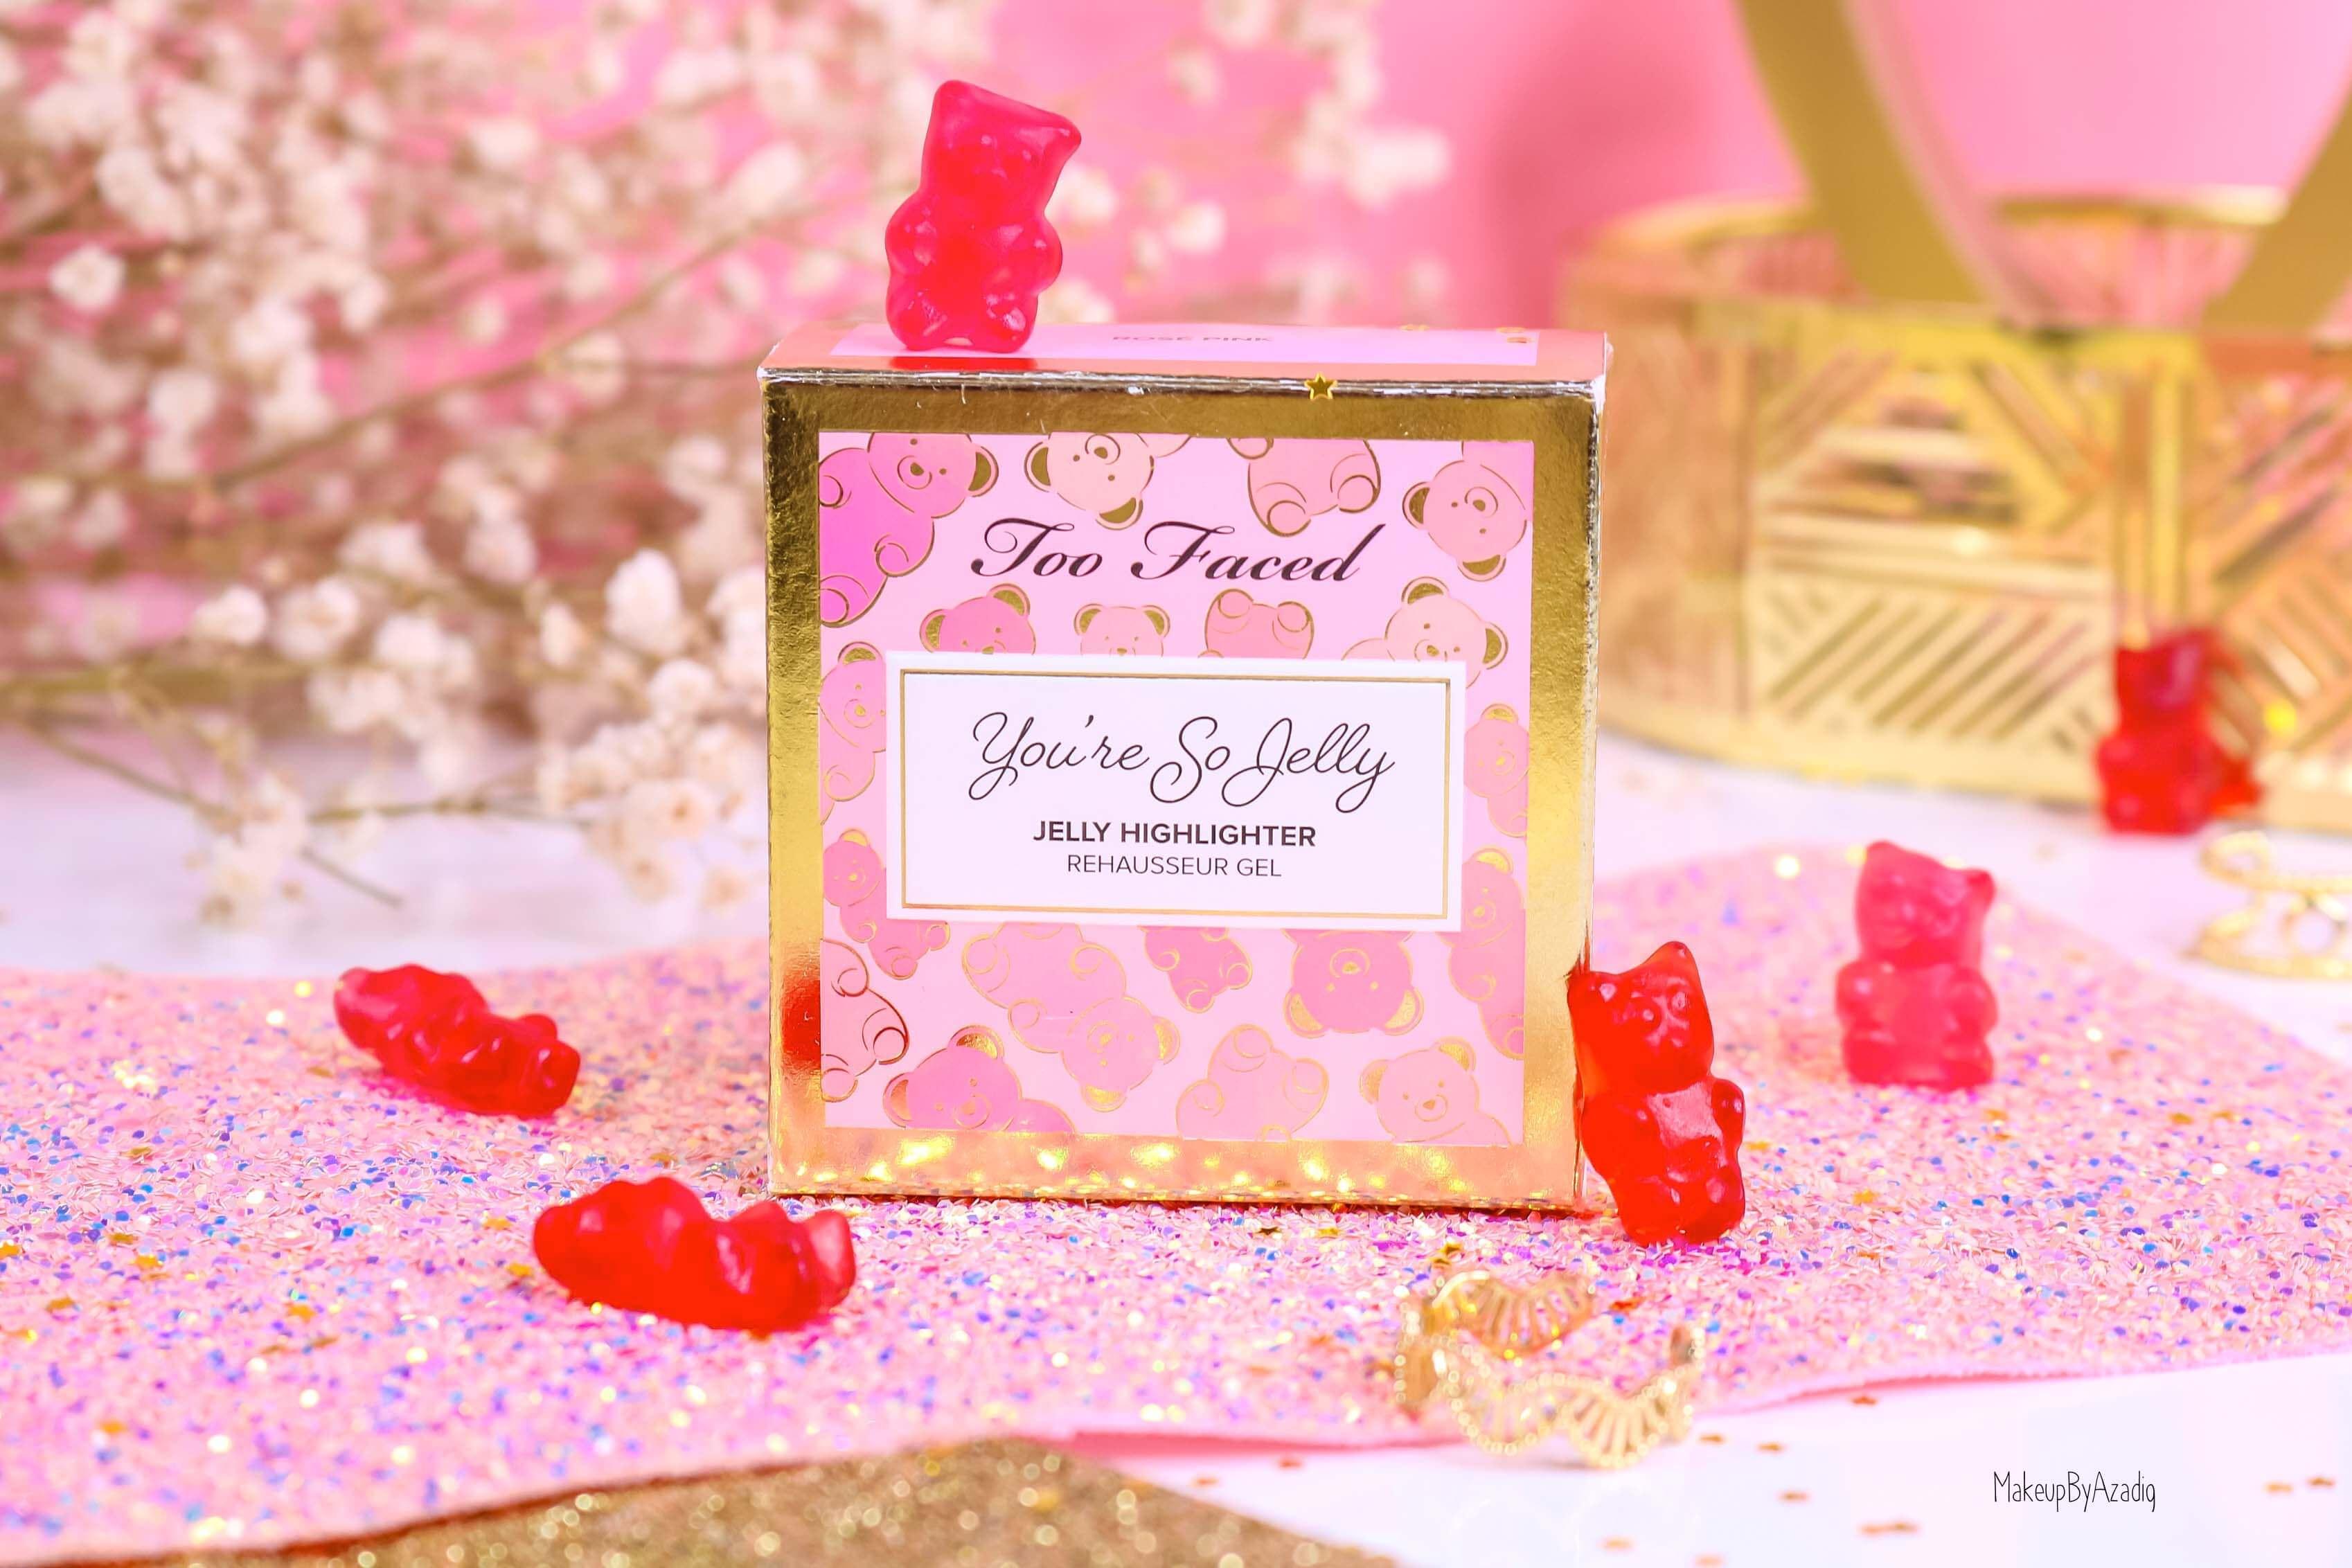 revue-highlighter-jelly-gel-rose-pink-too-faced-texture-cute-avis-prix-swatch-makeupbyazadig-sephora-france-incroyable